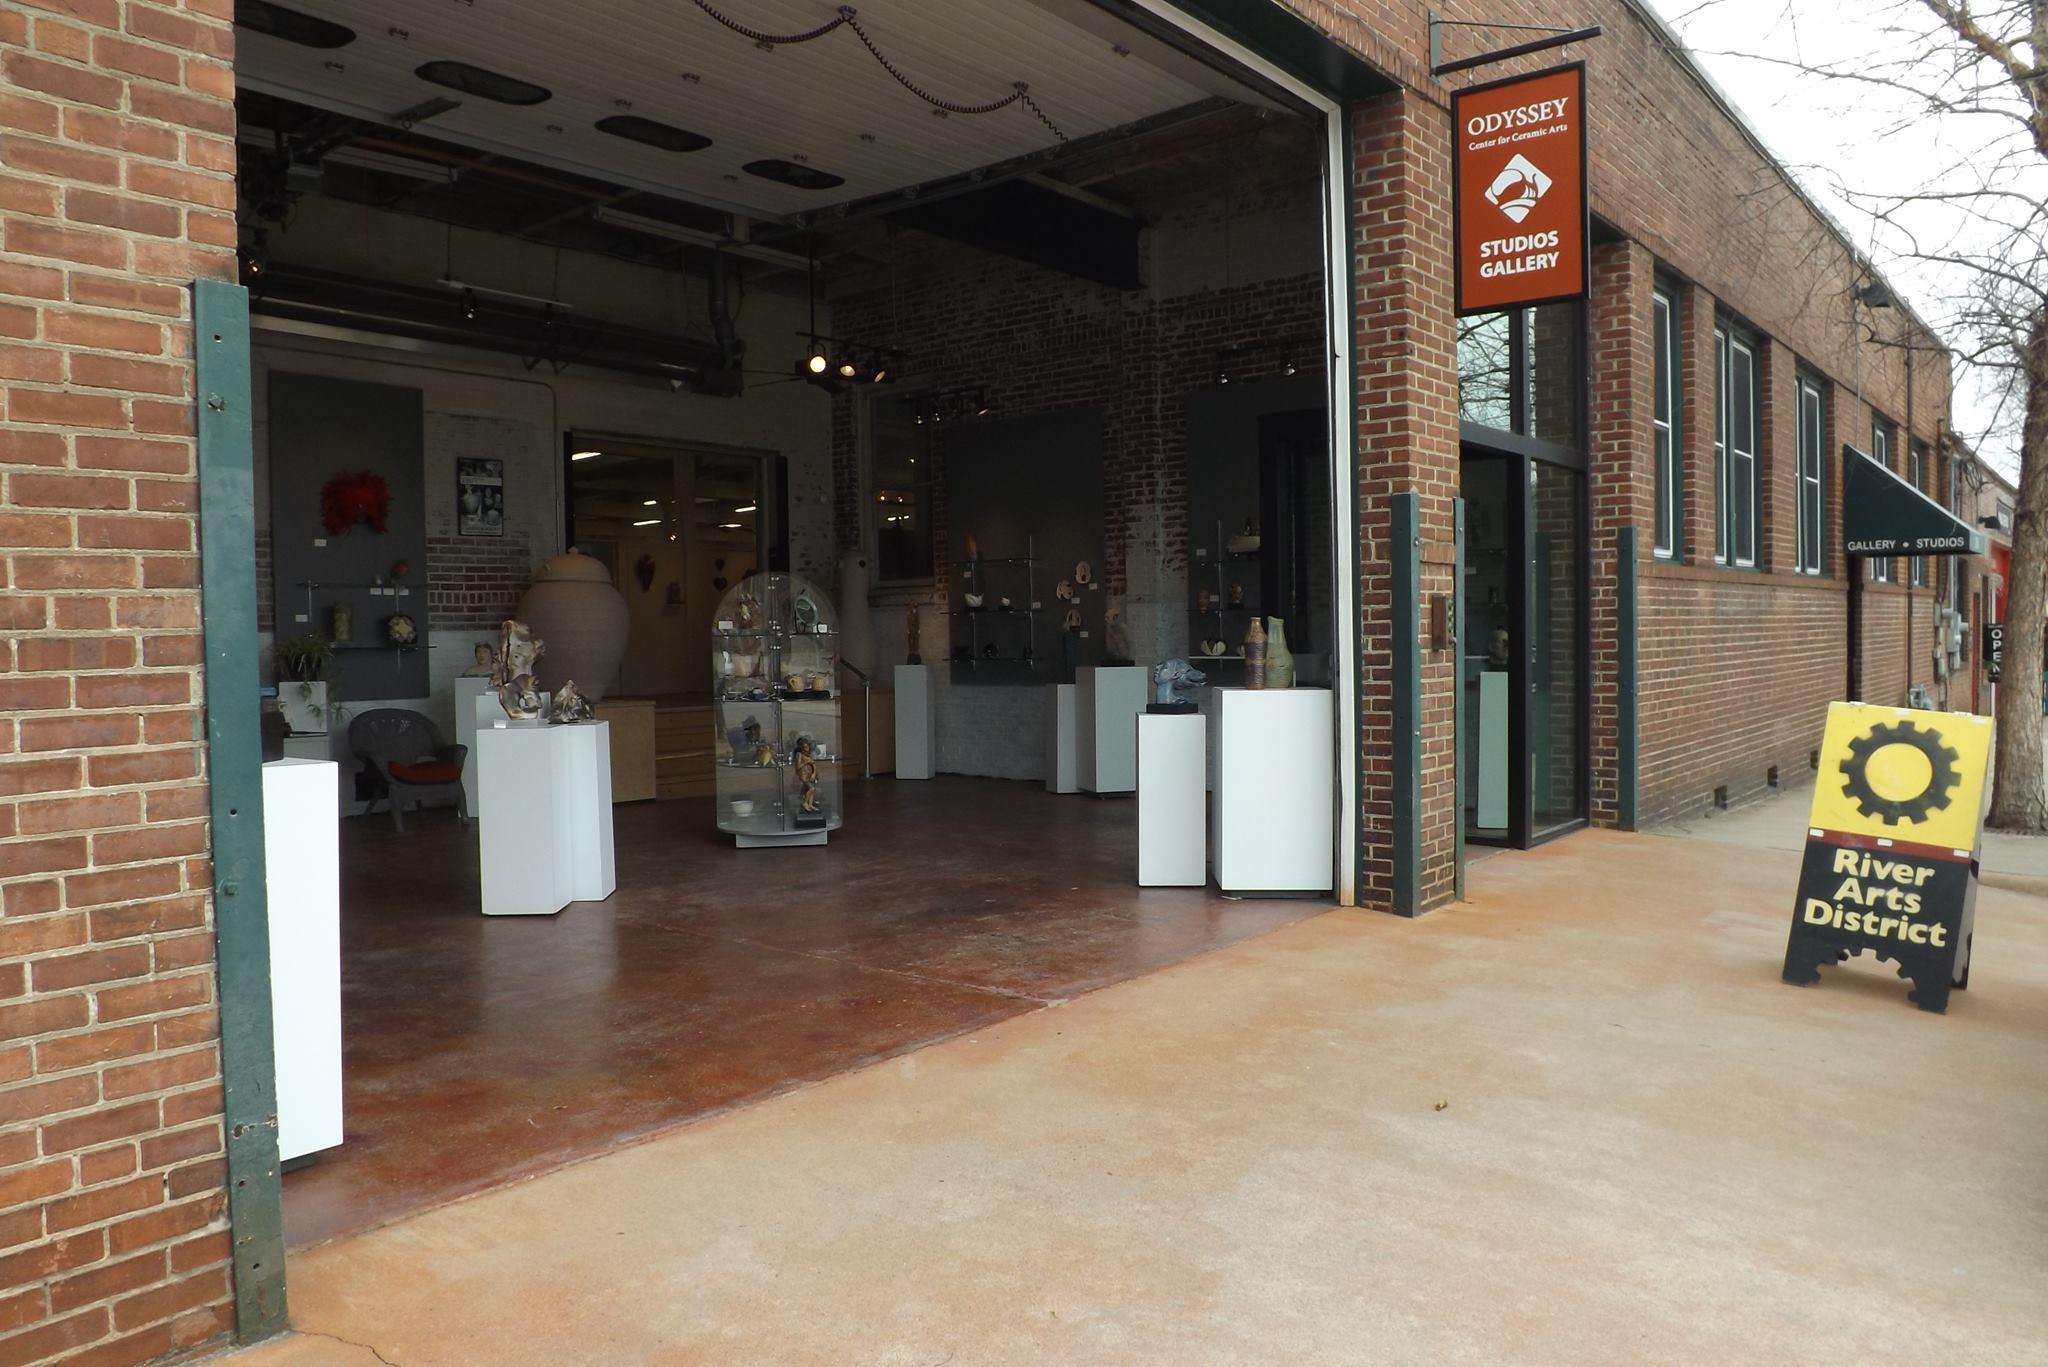 Odyssey co op gallery footer3 local flavor avl visit explore art scene asheville